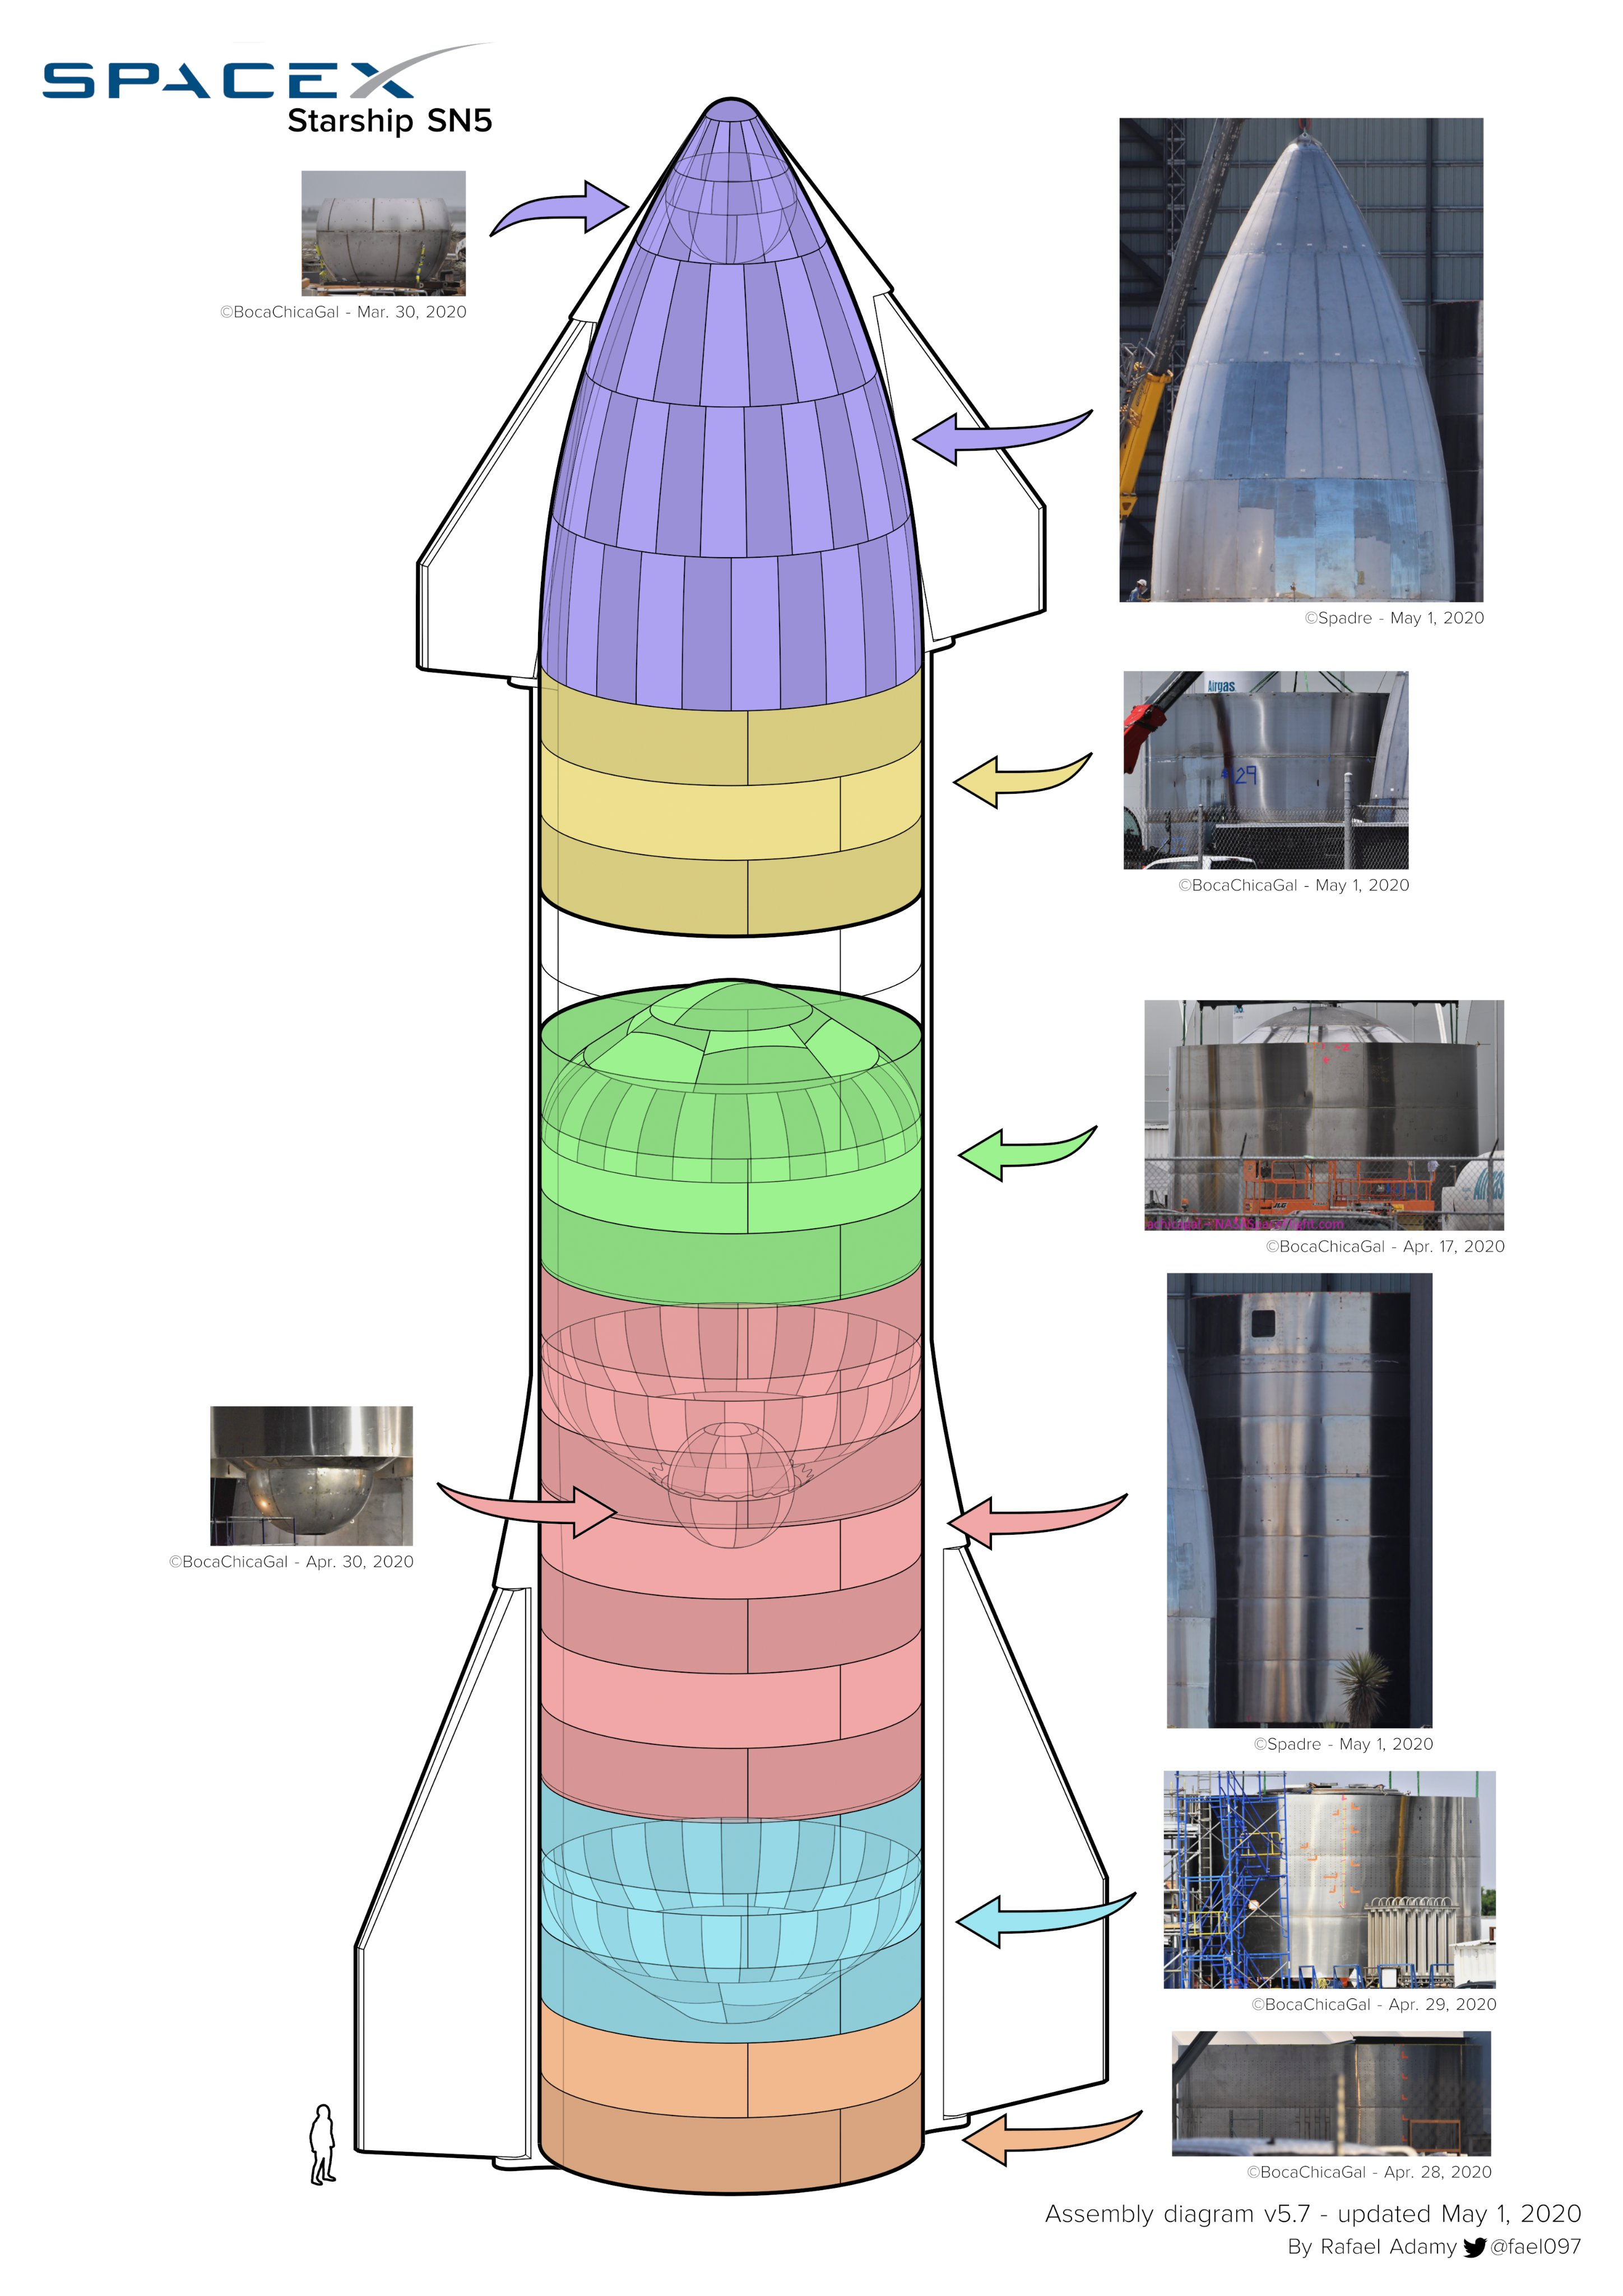 Starship SN5 (Boca Chica) - Page 3 EW91CSxWkAEwFaS?format=jpg&name=4096x4096